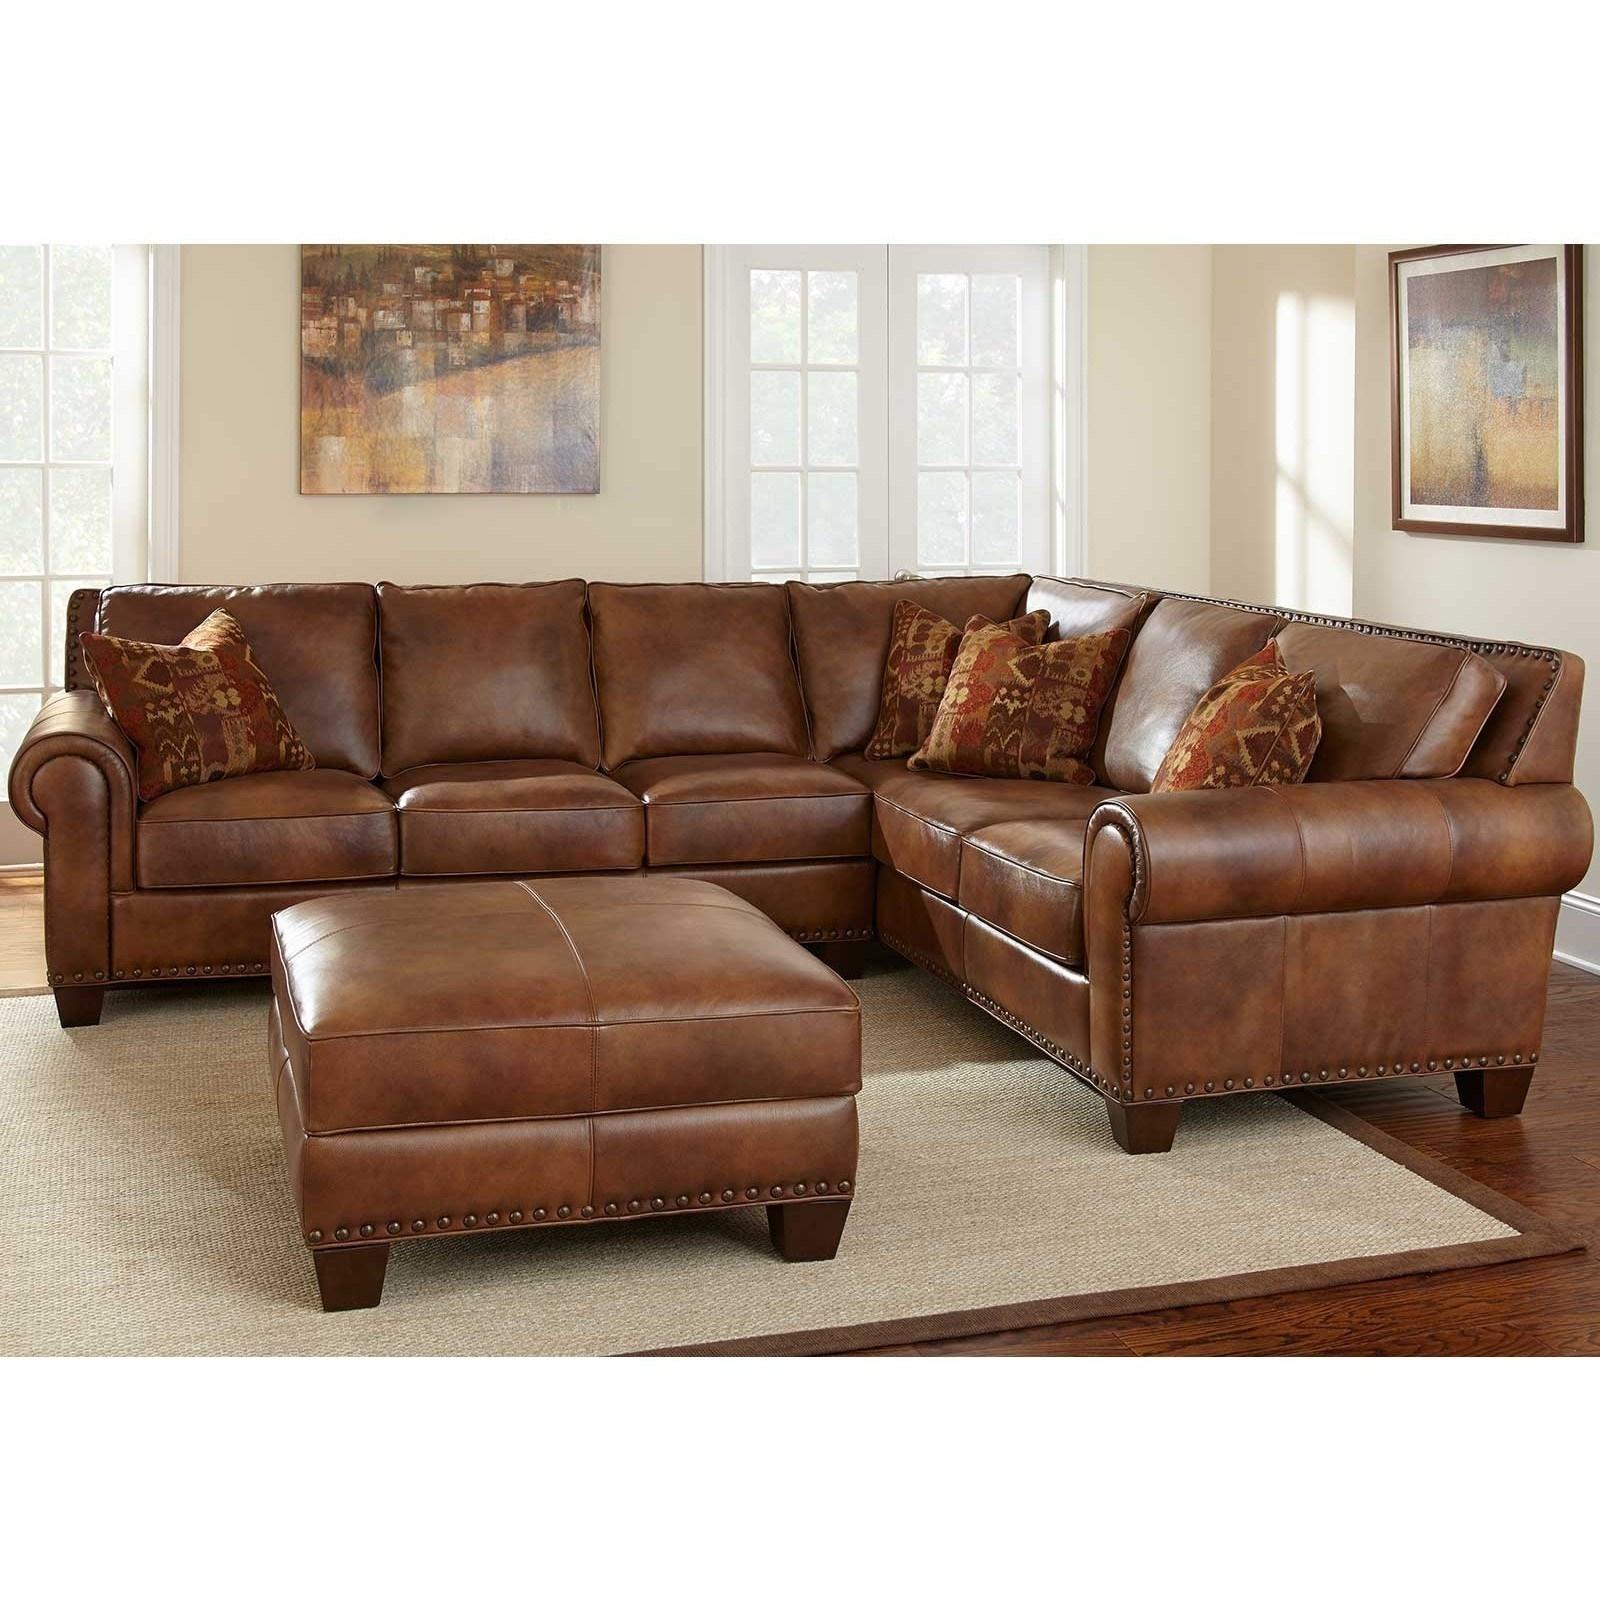 simplicity sofas nc sofa wall bed system 10 inspirations north carolina sectional ideas